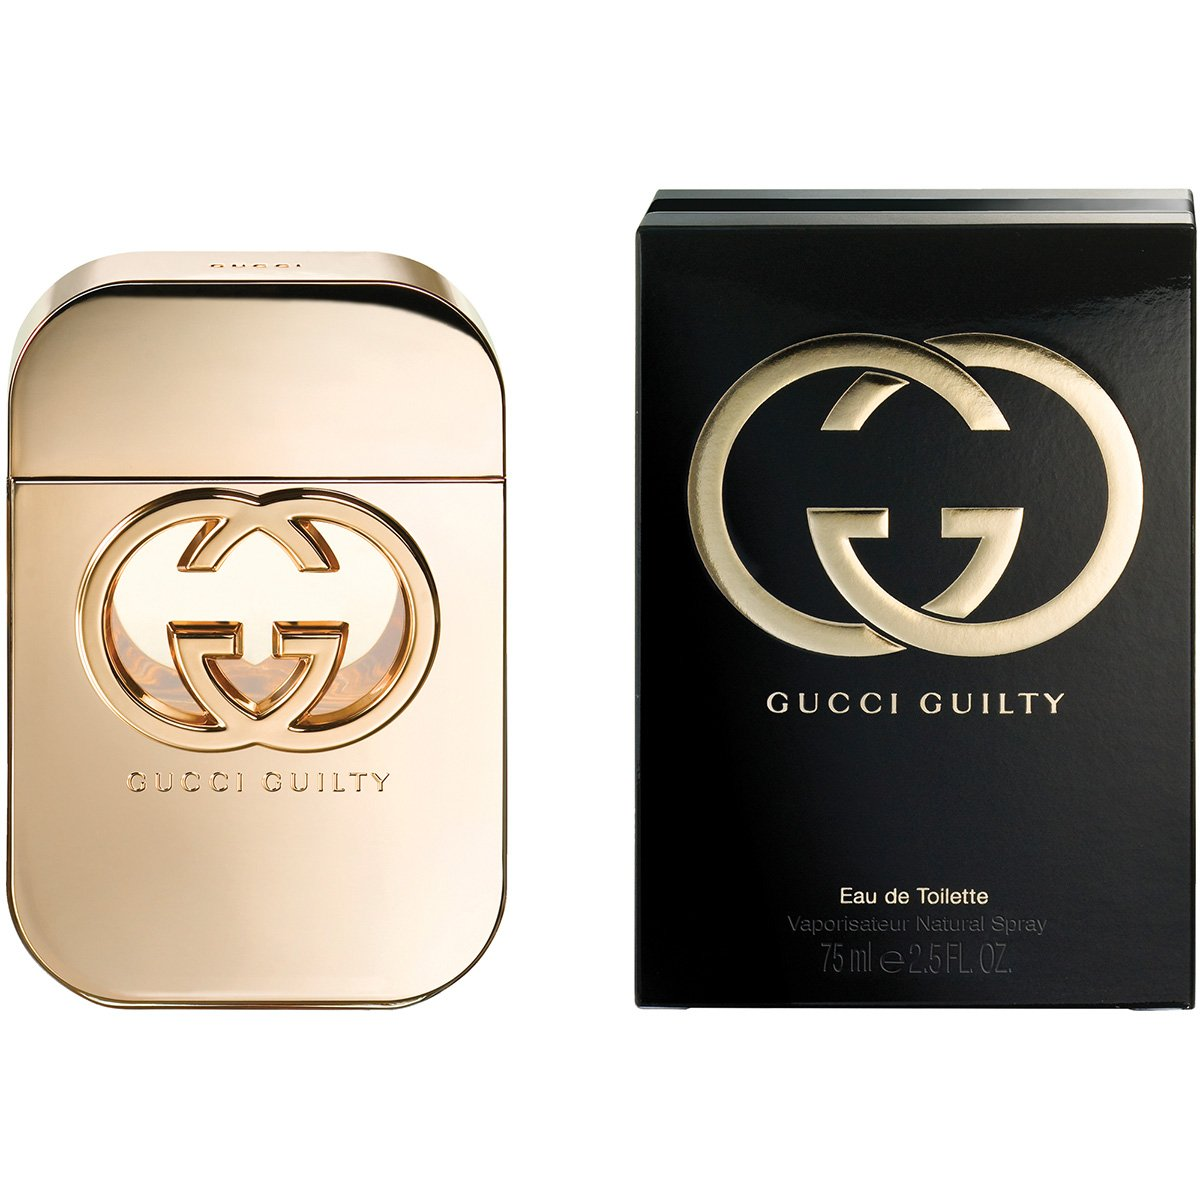 ae1cca349 Fragancia Gucci Guilty Edt 75 ml Gc338262   SEARS.COM.MX - Me entiende!